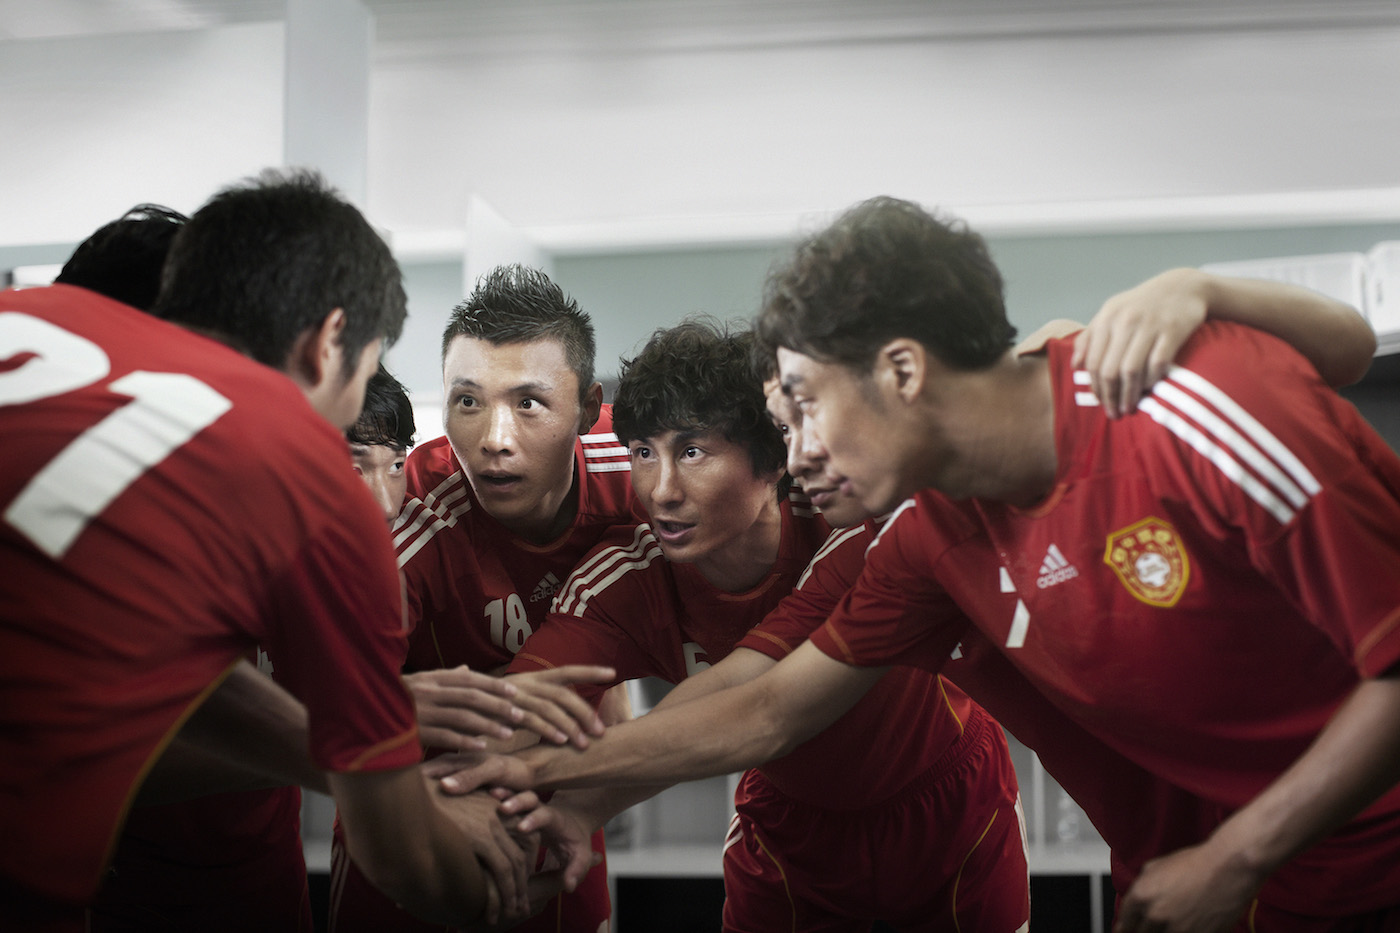 adidas_football 0419+_1105.jpg